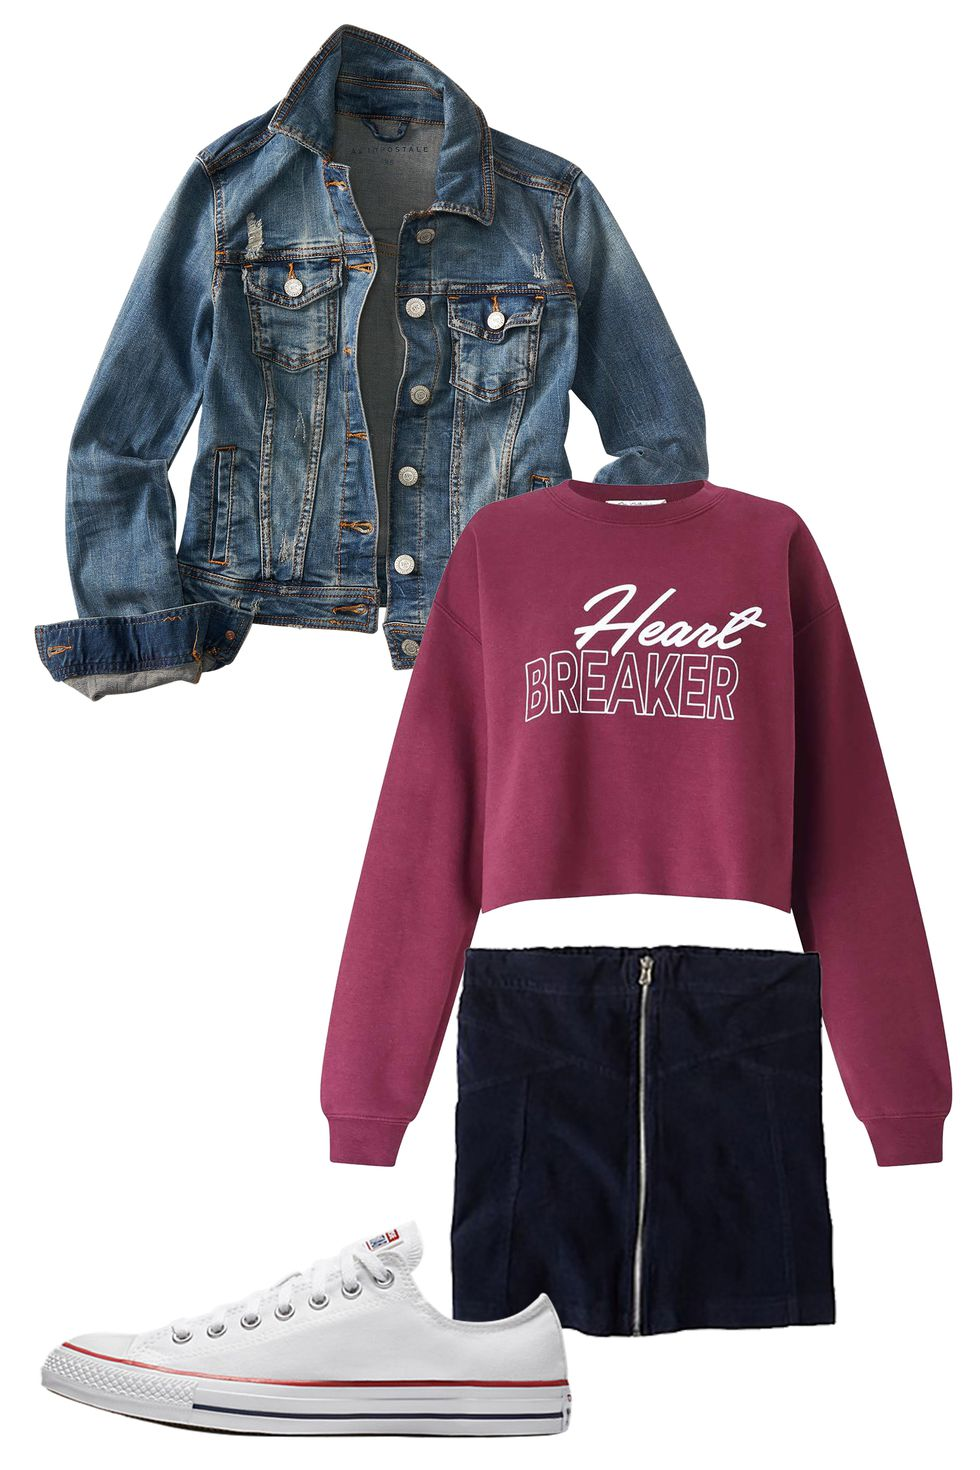 black-mini-skirt-burgundy-sweater-sweatshirt-graphic-blue-med-jacket-jean-white-shoe-sneakers-converse-howtowear-valentinesday-outfit-fall-winter-weekend.jpg